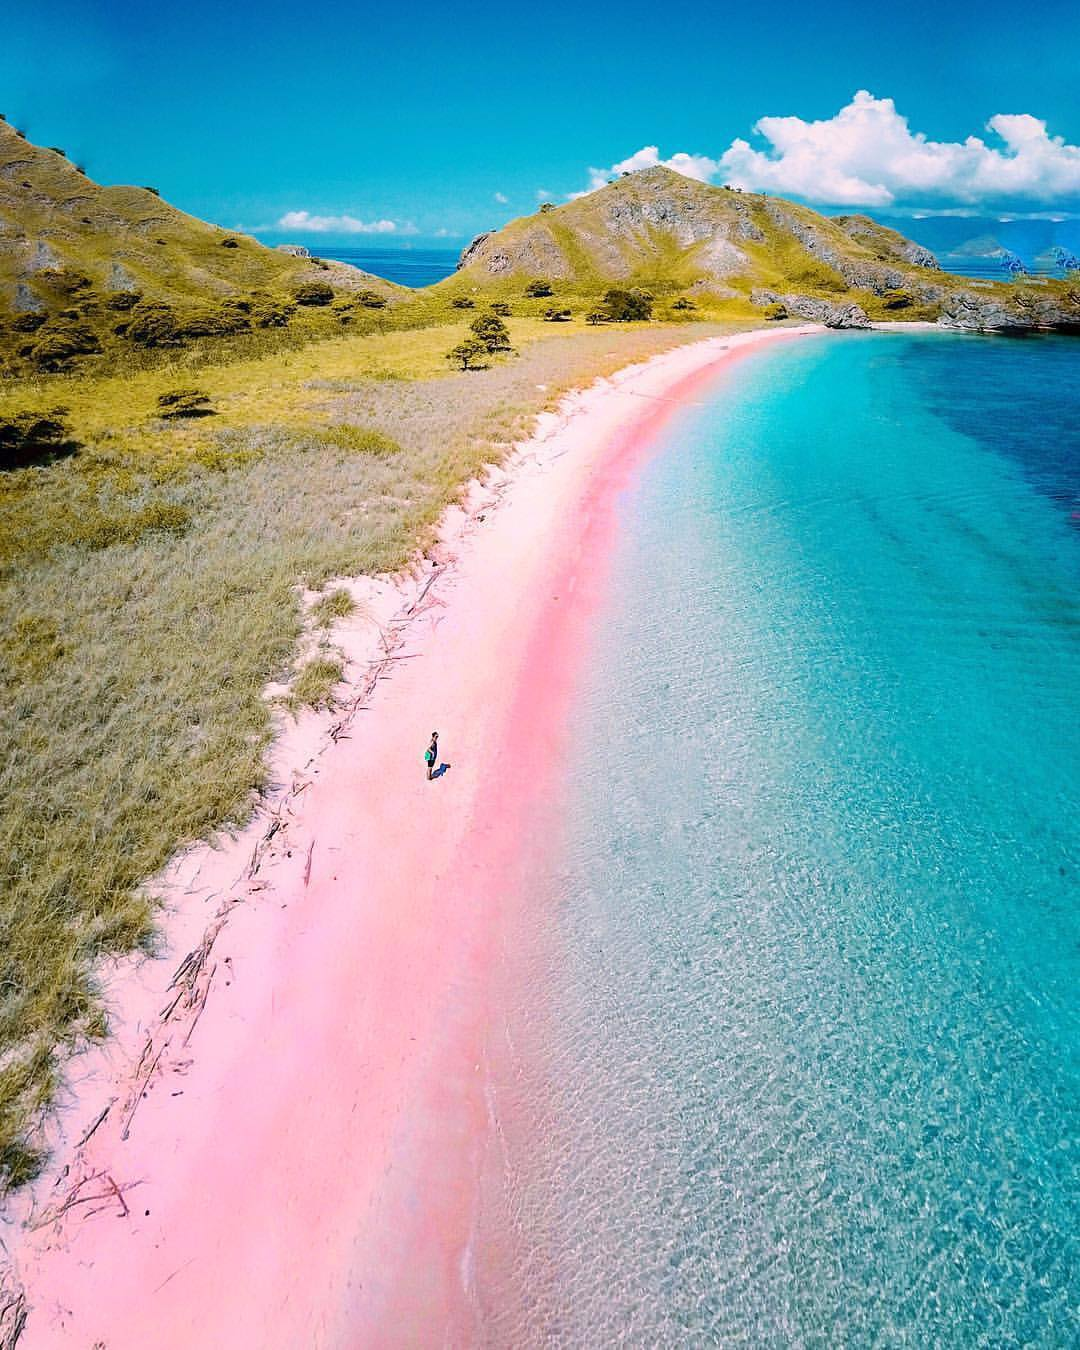 Pink beach of Komodo Island 🏖 Photo by  @hendrickhartono